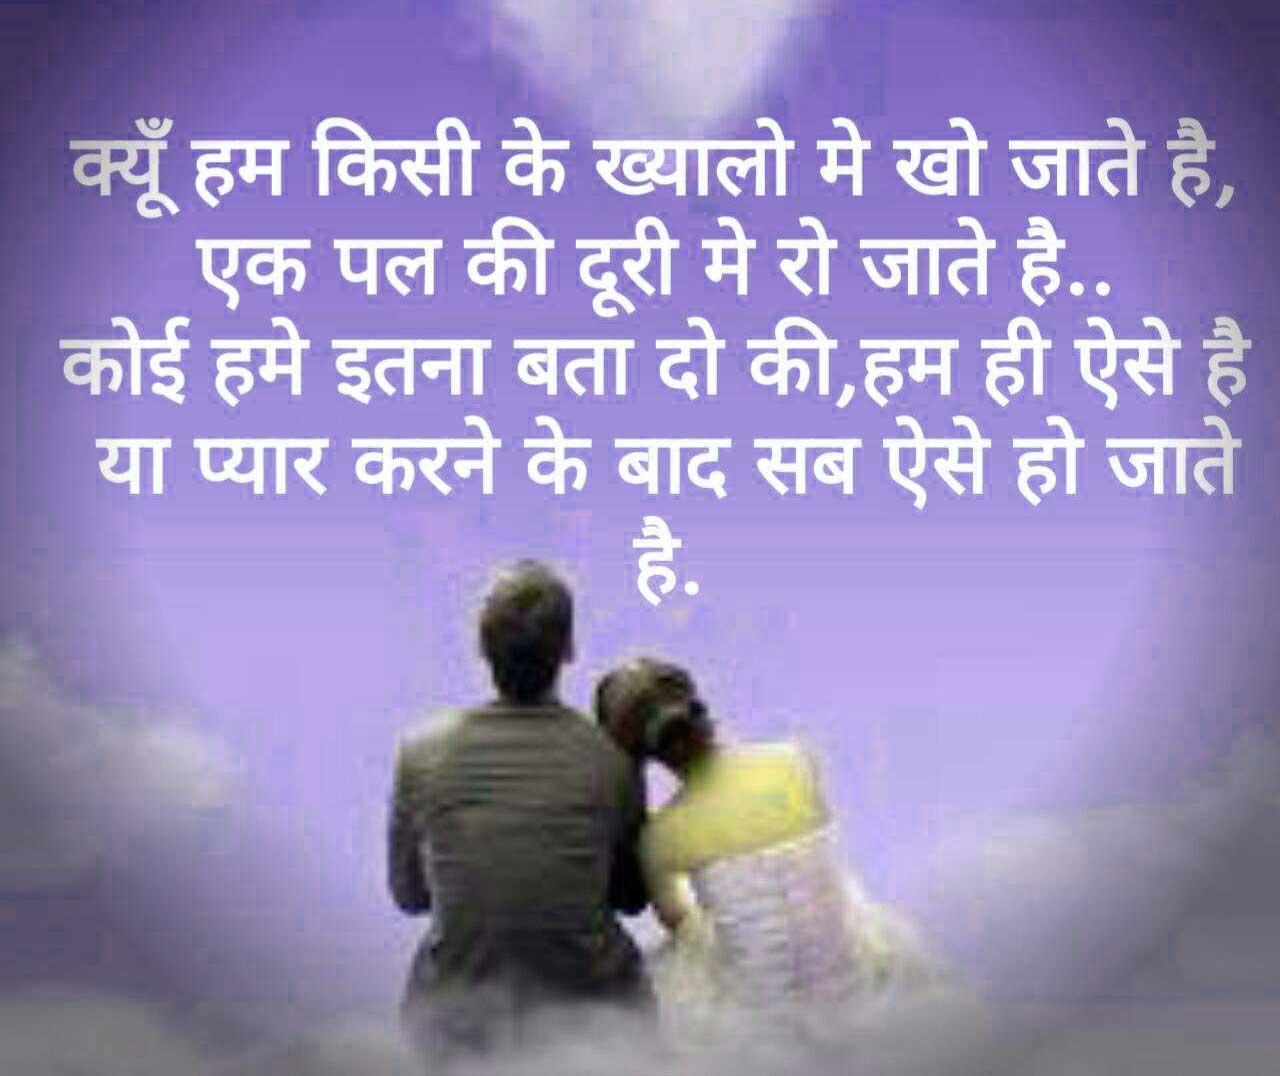 Hindi Love Whatsapp DP Photo Free HD